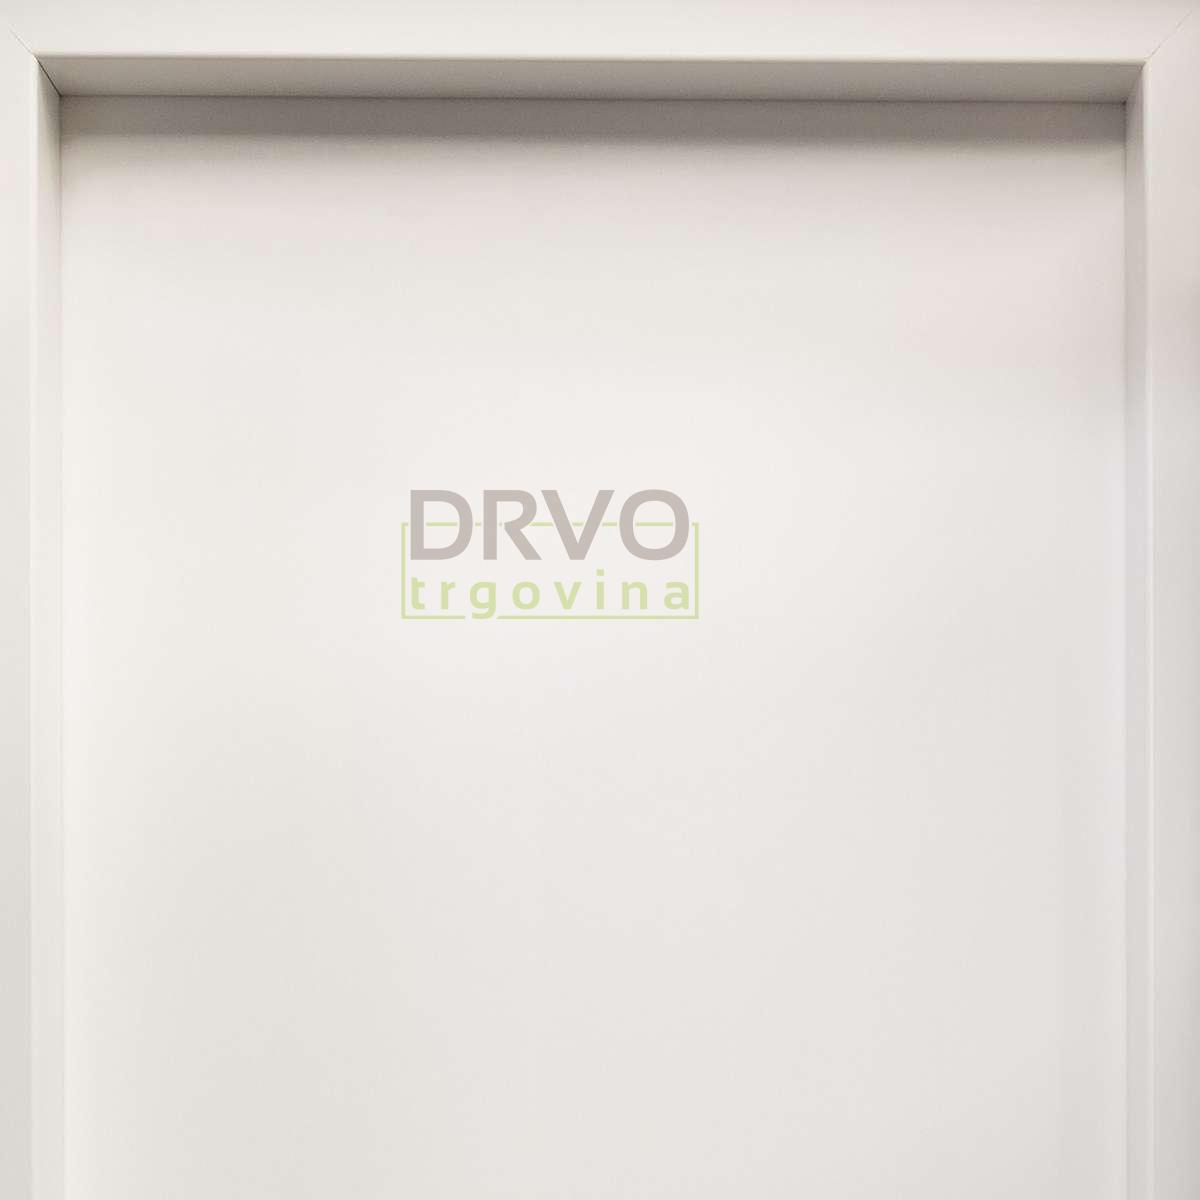 KOMPLET VRATA ENDURO S DOVRATNIKOM 10cm B134 bijela